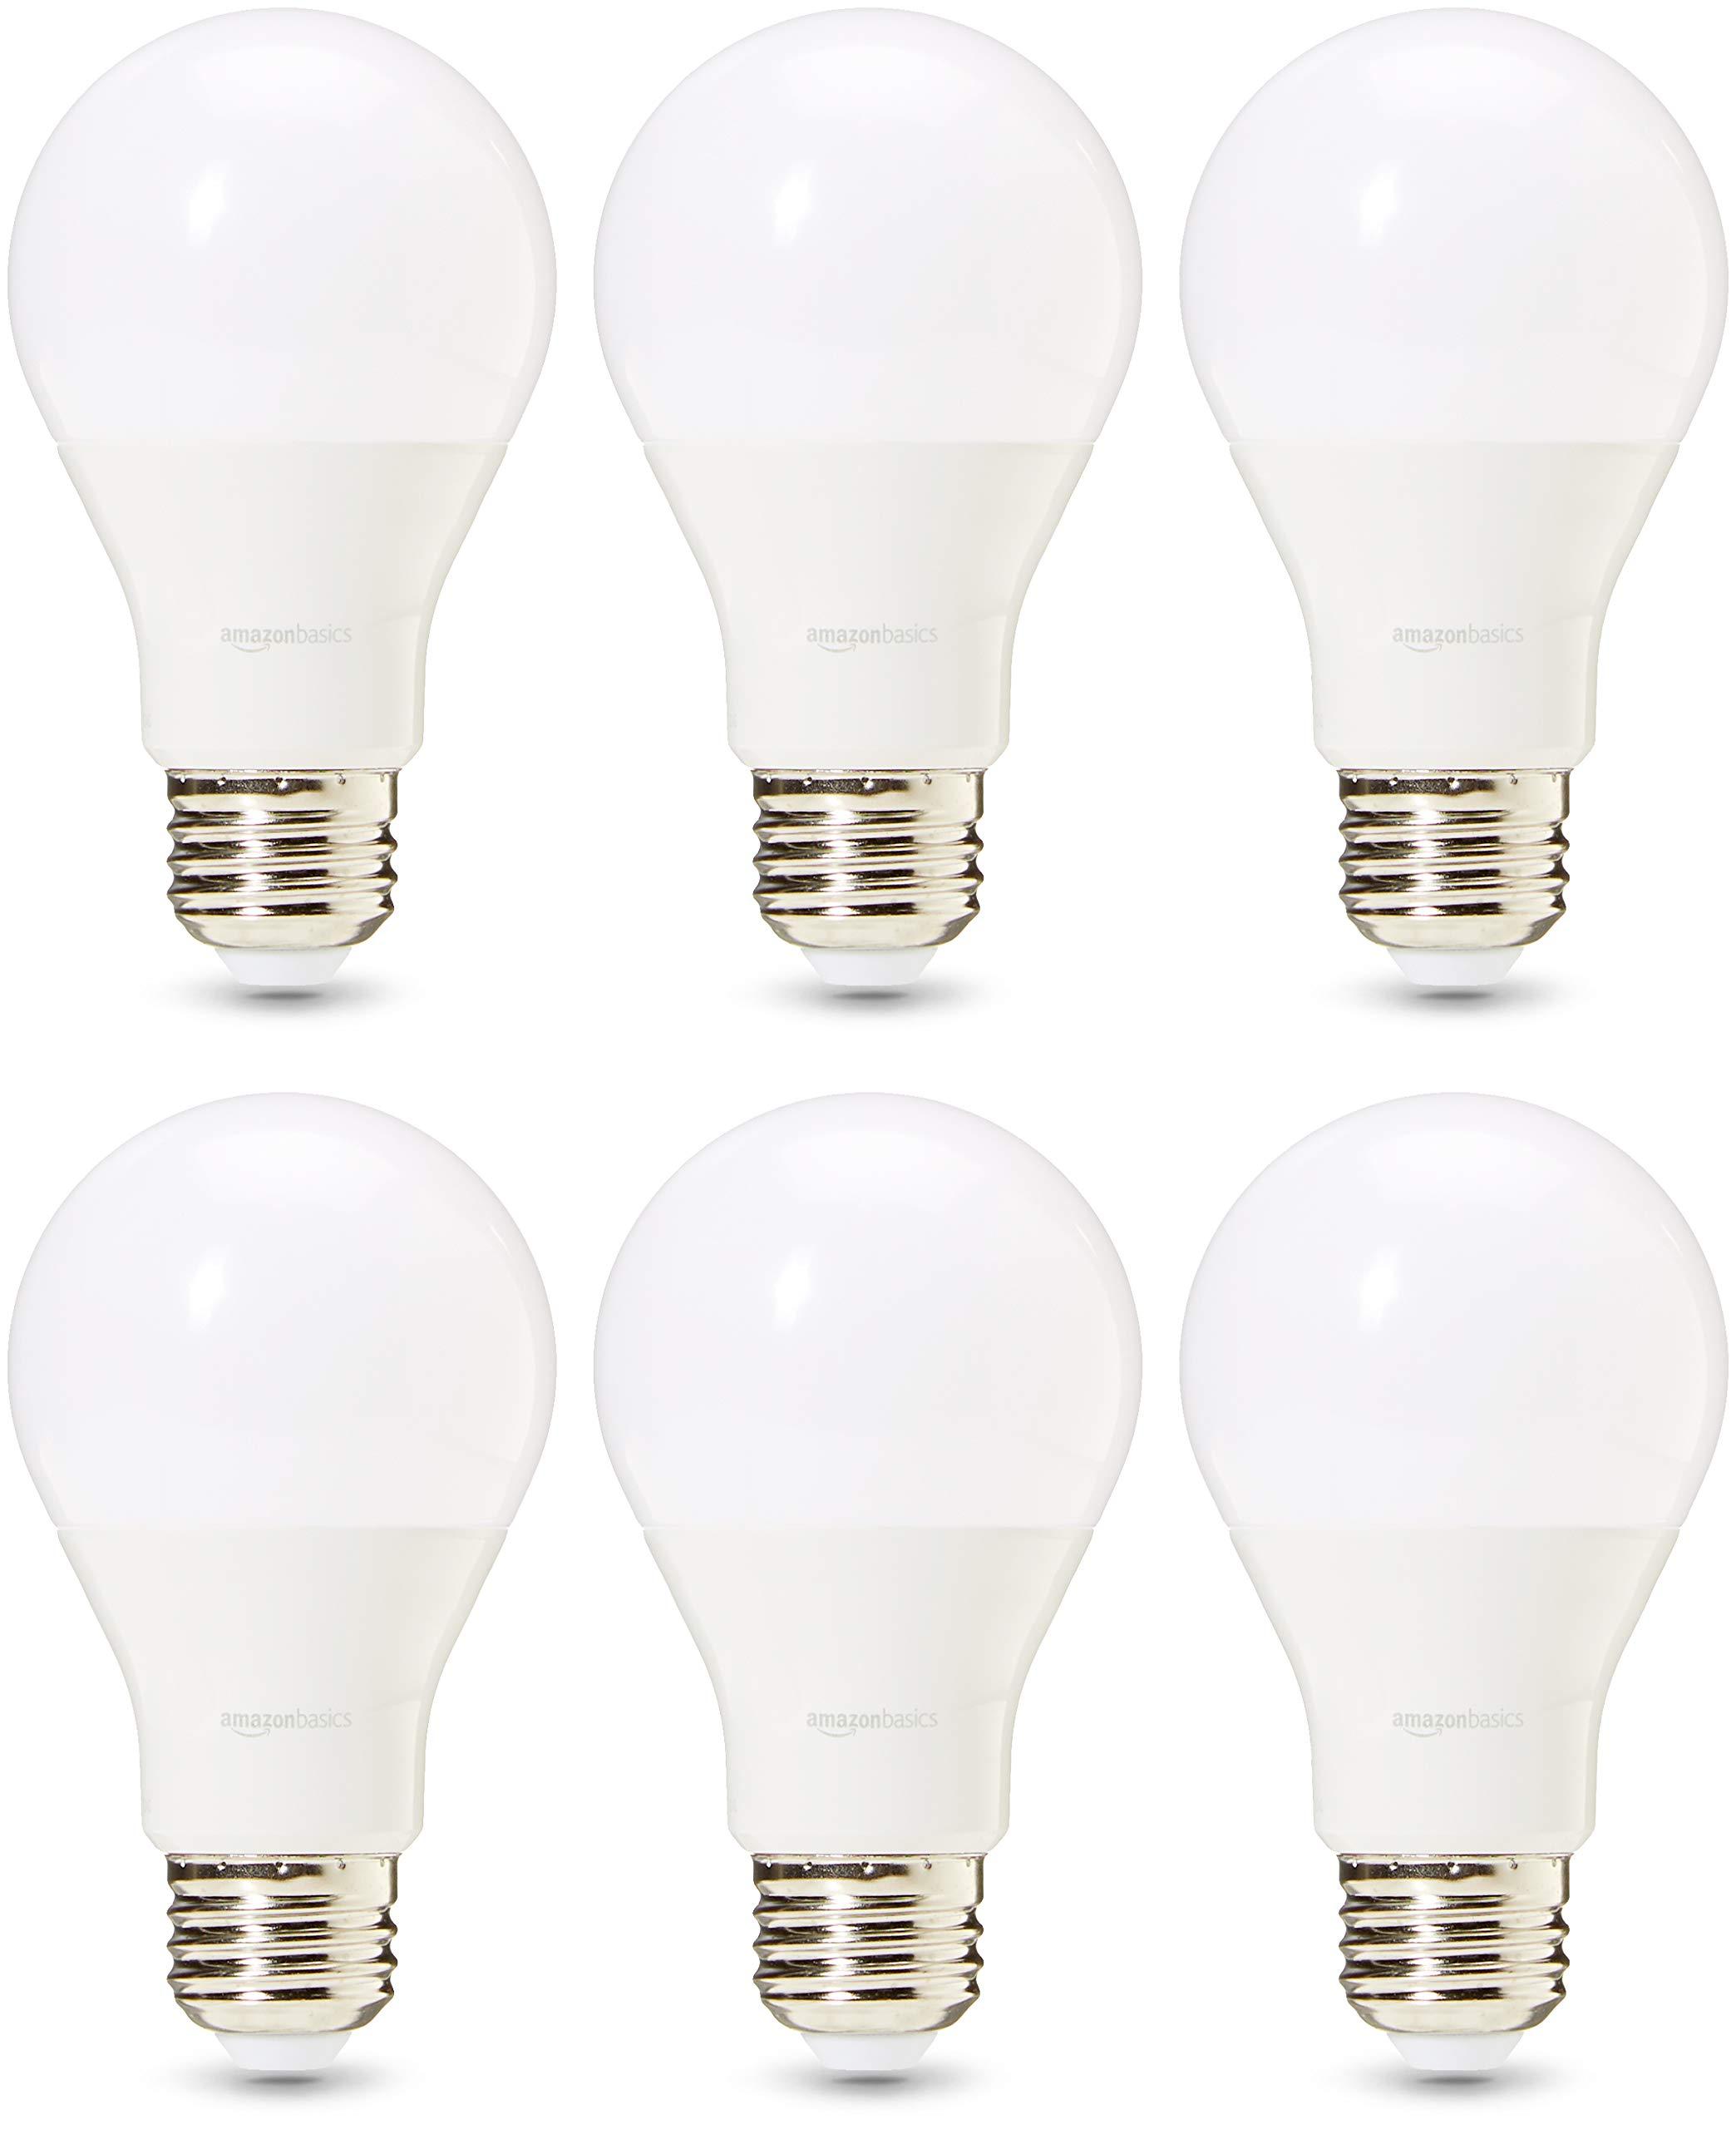 AmazonBasics Commercial Grade LED Light Bulb   40-Watt Equivalent, A19, Daylight, Dimmable, 6-Pack